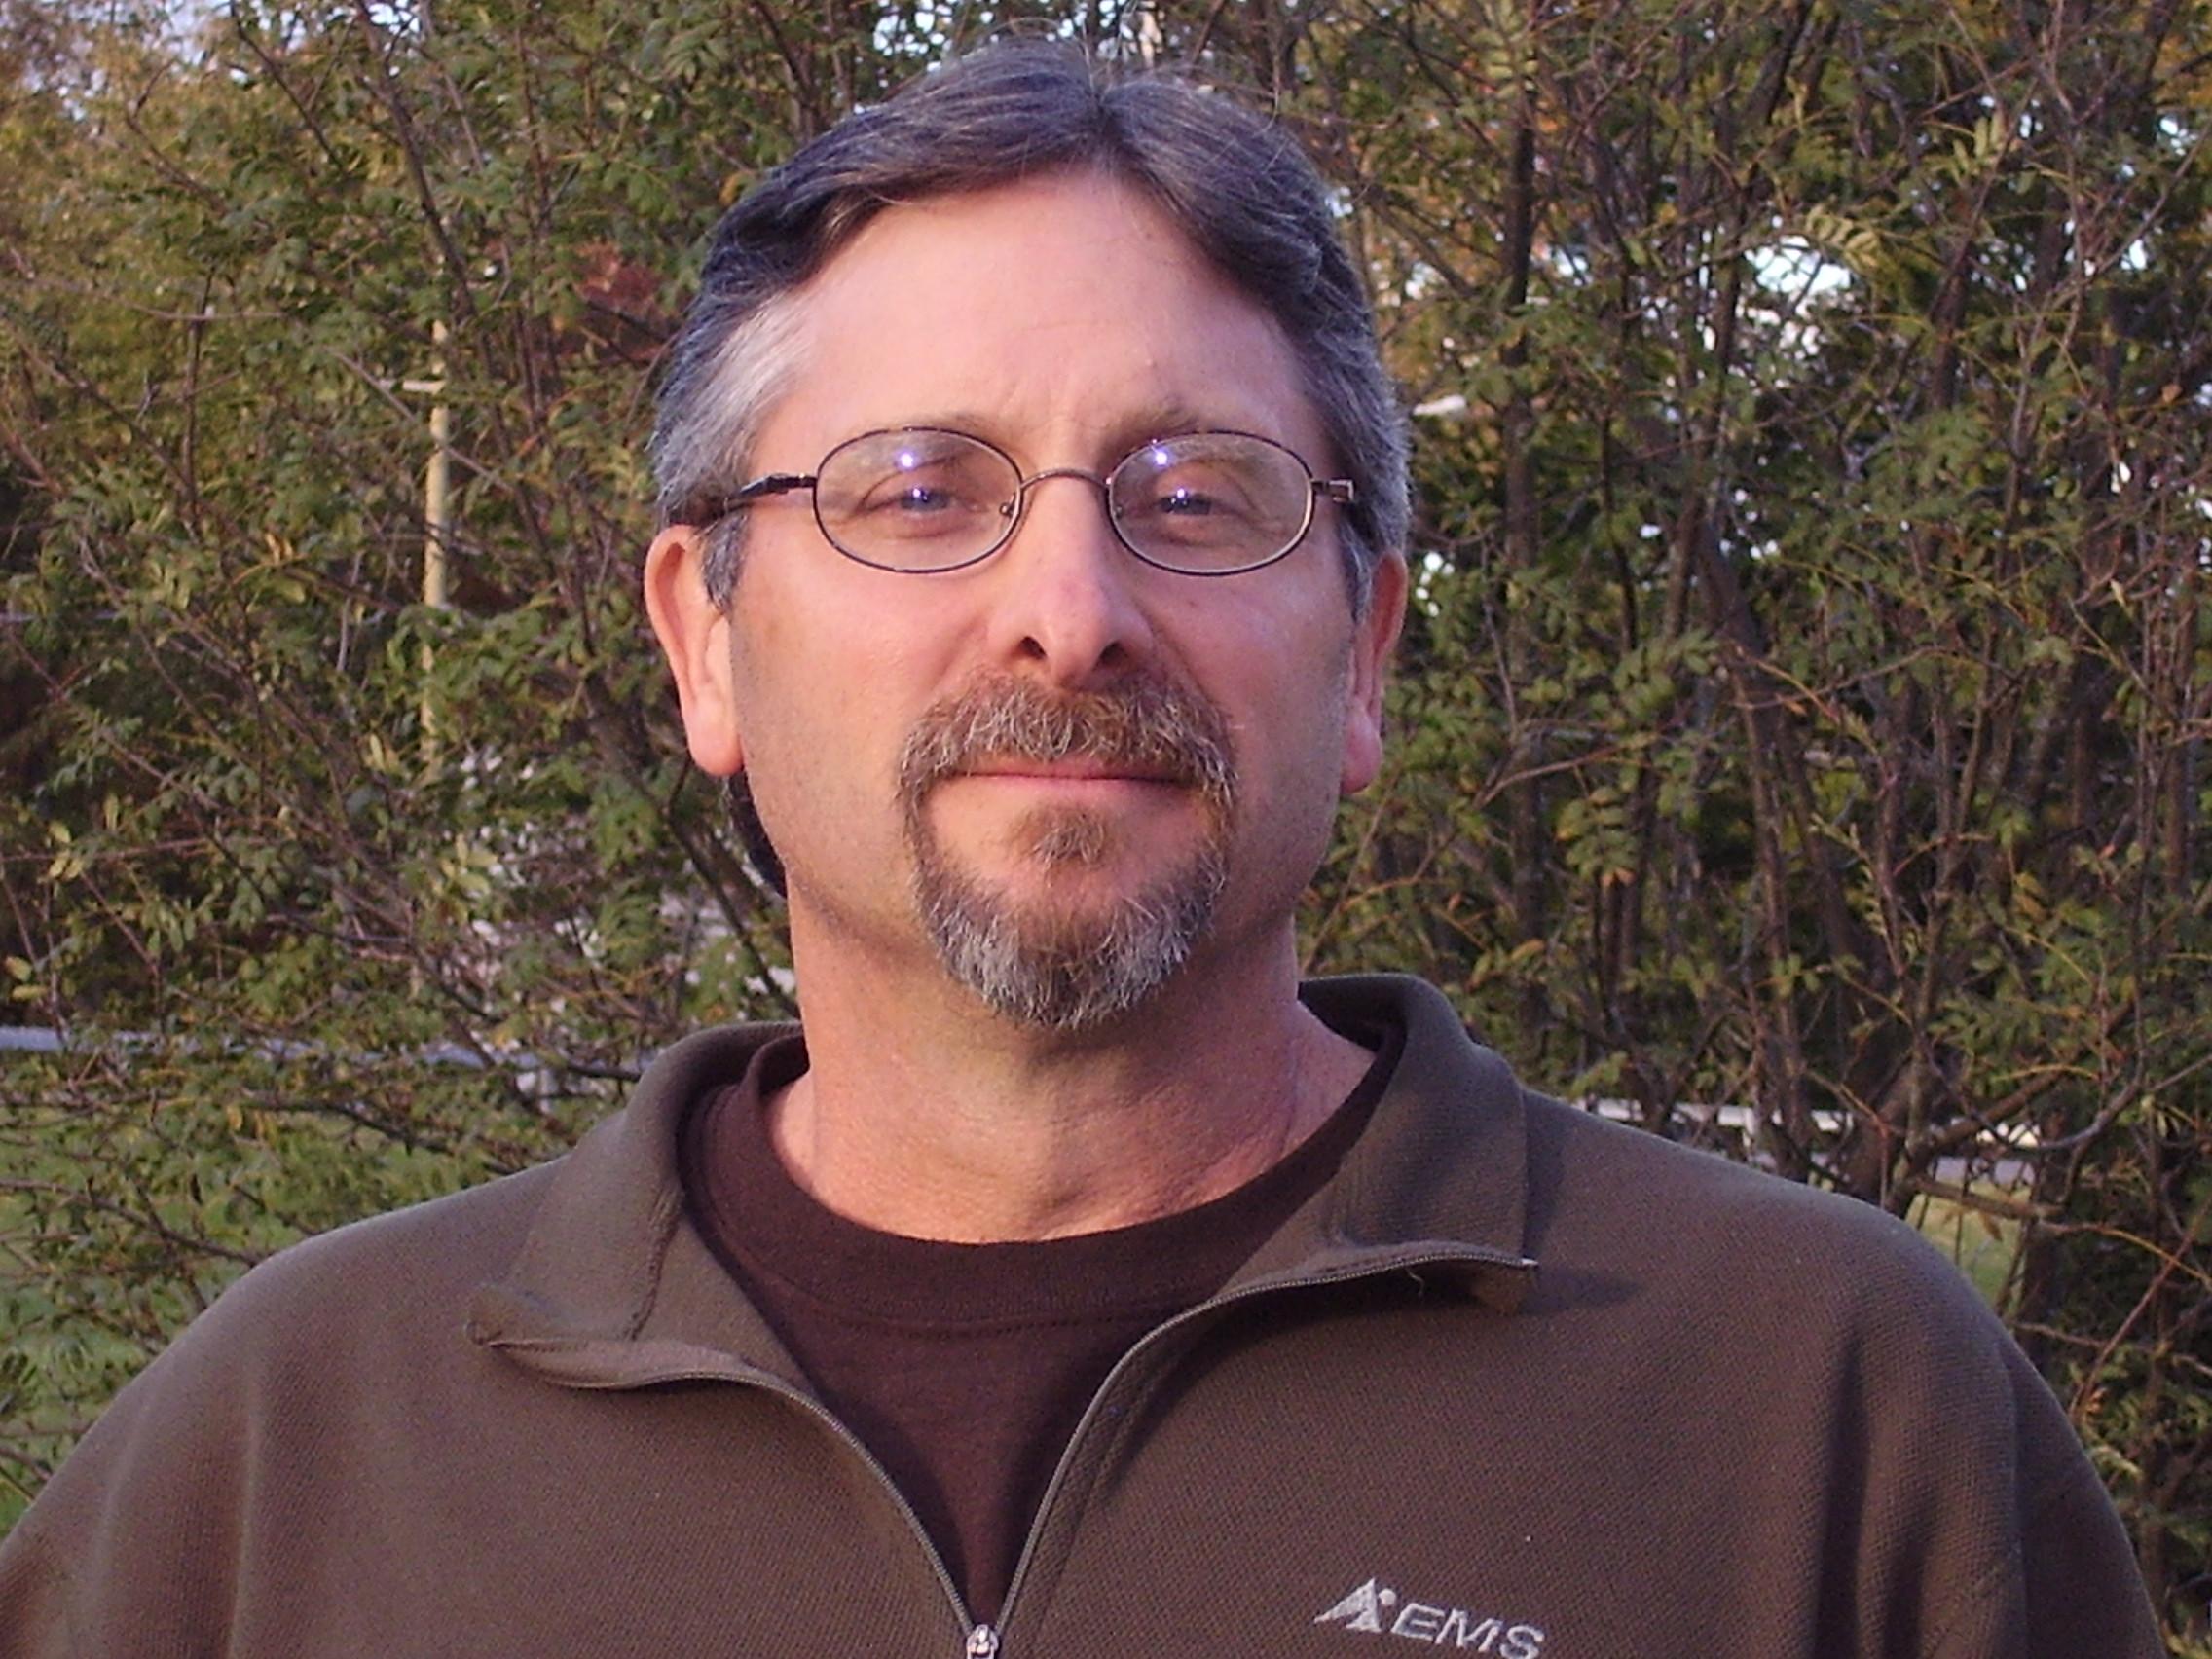 Phil Metzger